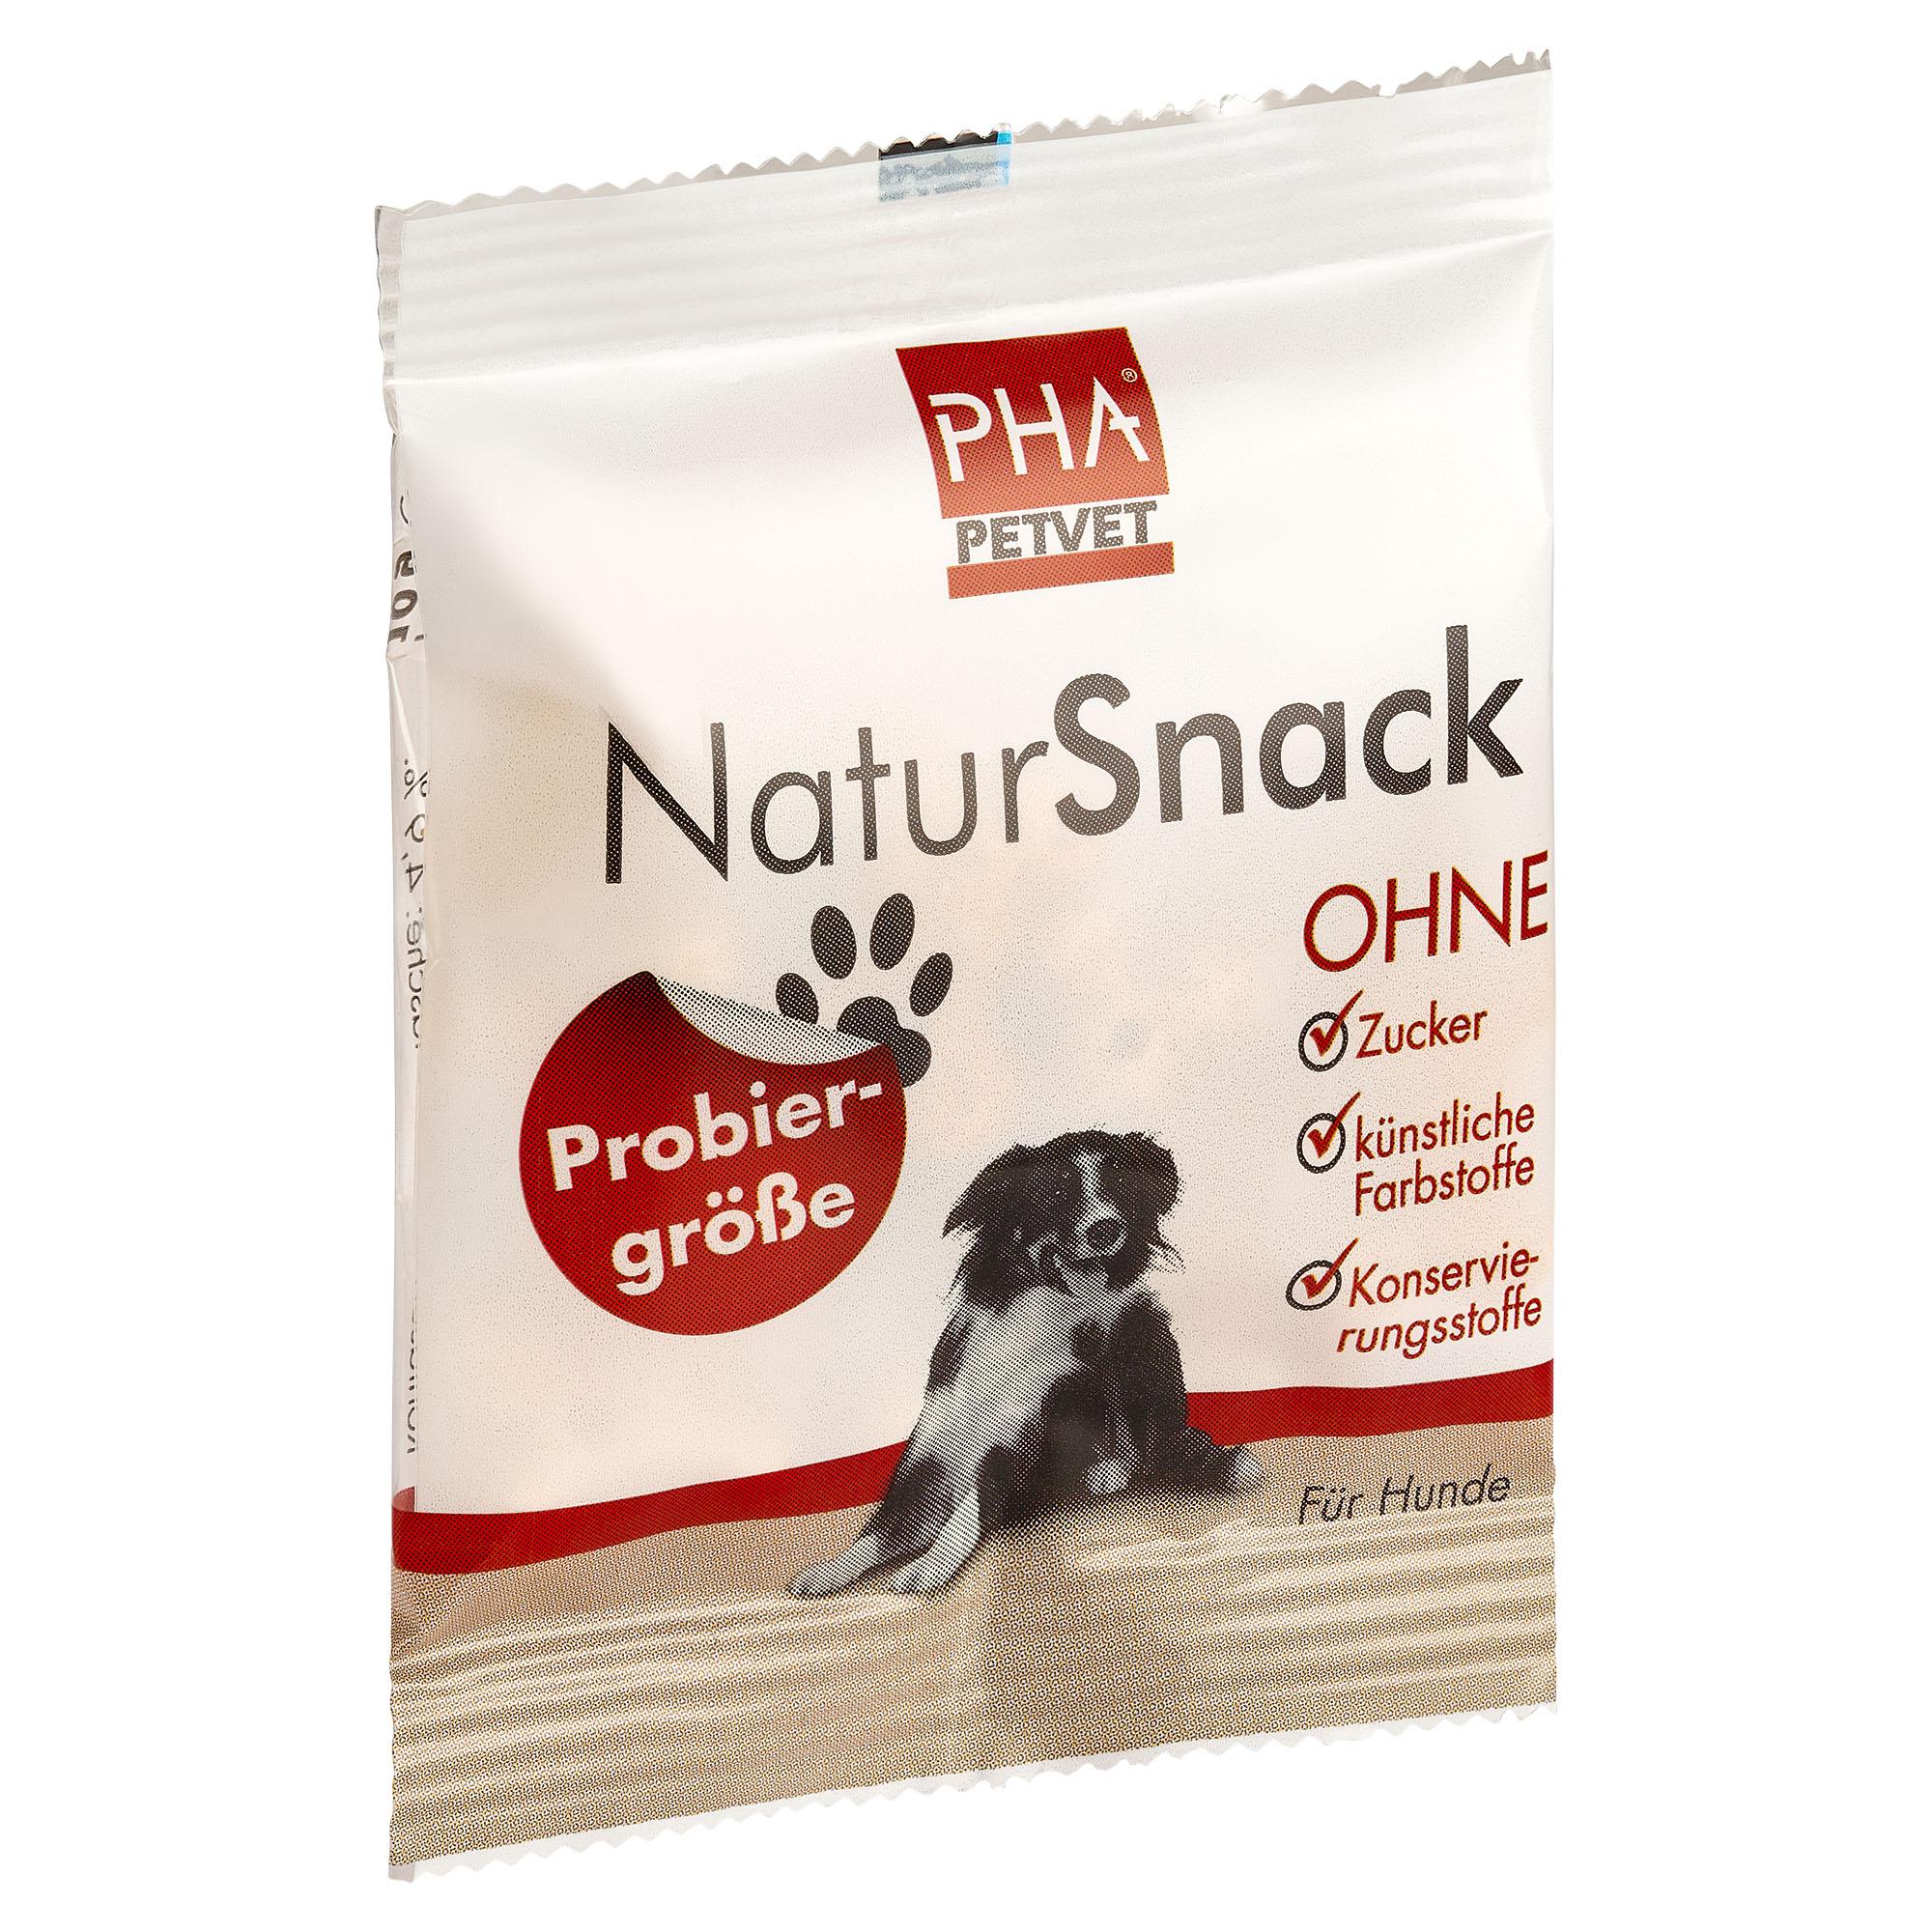 PHA NaturSnack für Hund Probiergröße